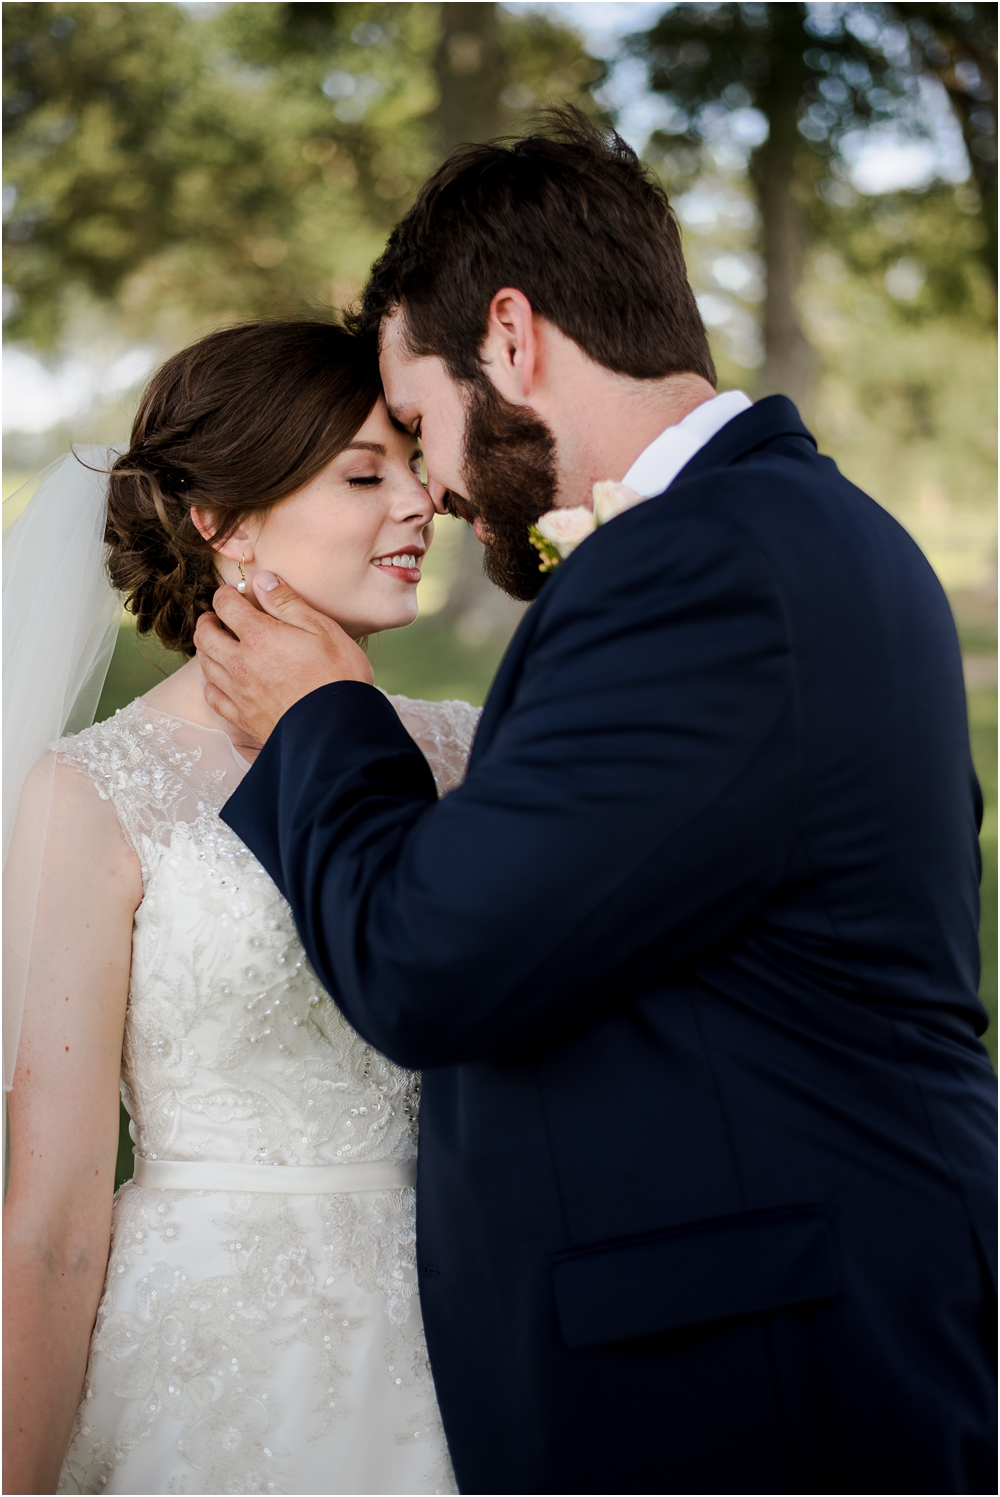 marianna-florida-wedding-photographer-kiersten-grant-75.jpg